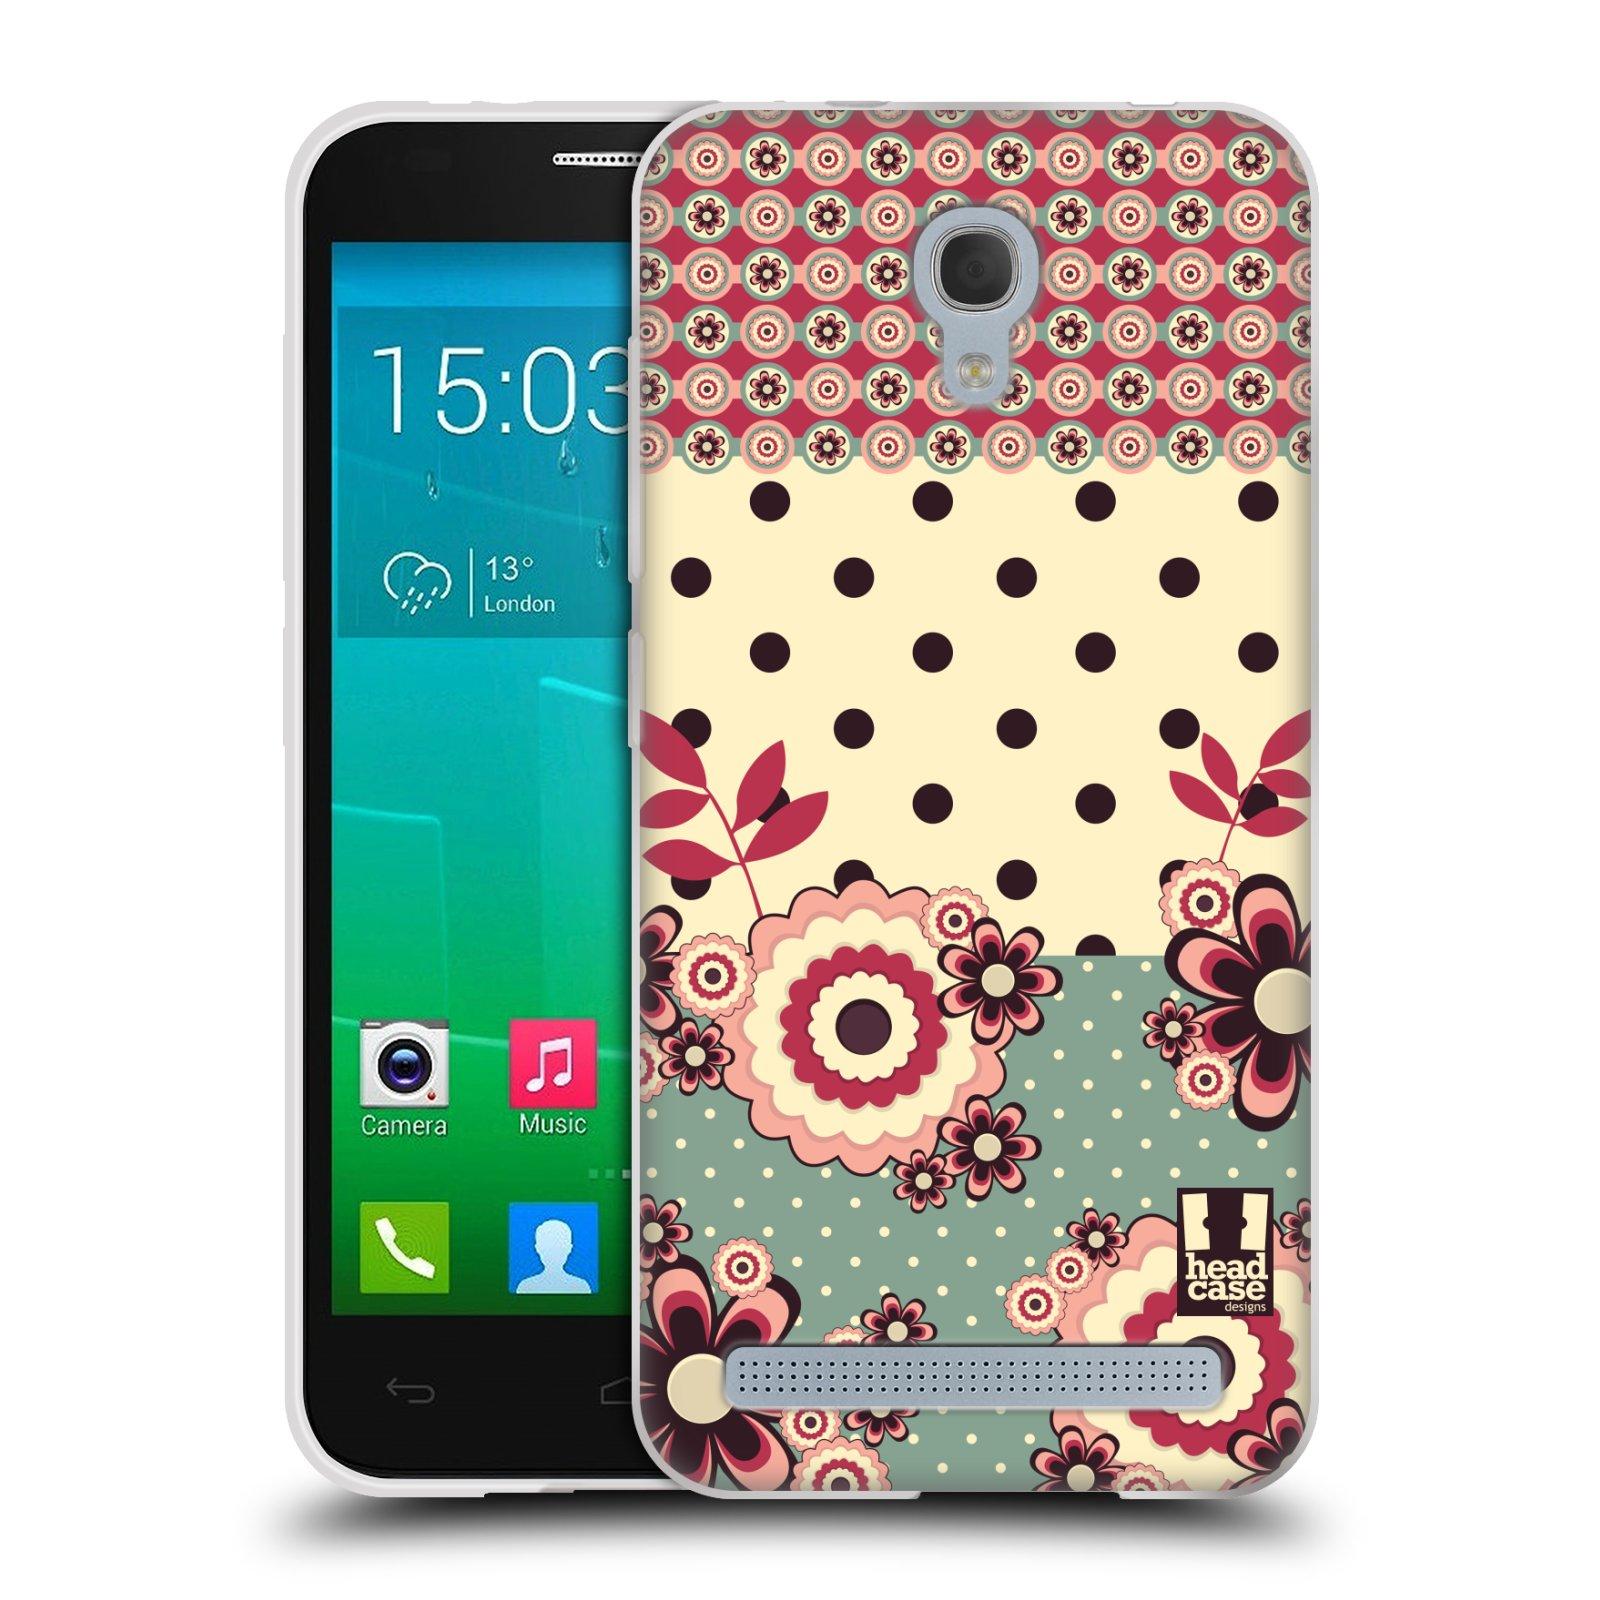 Silikonové pouzdro na mobil Alcatel One Touch Idol 2 Mini S 6036Y HEAD CASE KVÍTKA PINK CREAM (Silikonový kryt či obal na mobilní telefon Alcatel Idol 2 Mini S OT-6036Y)